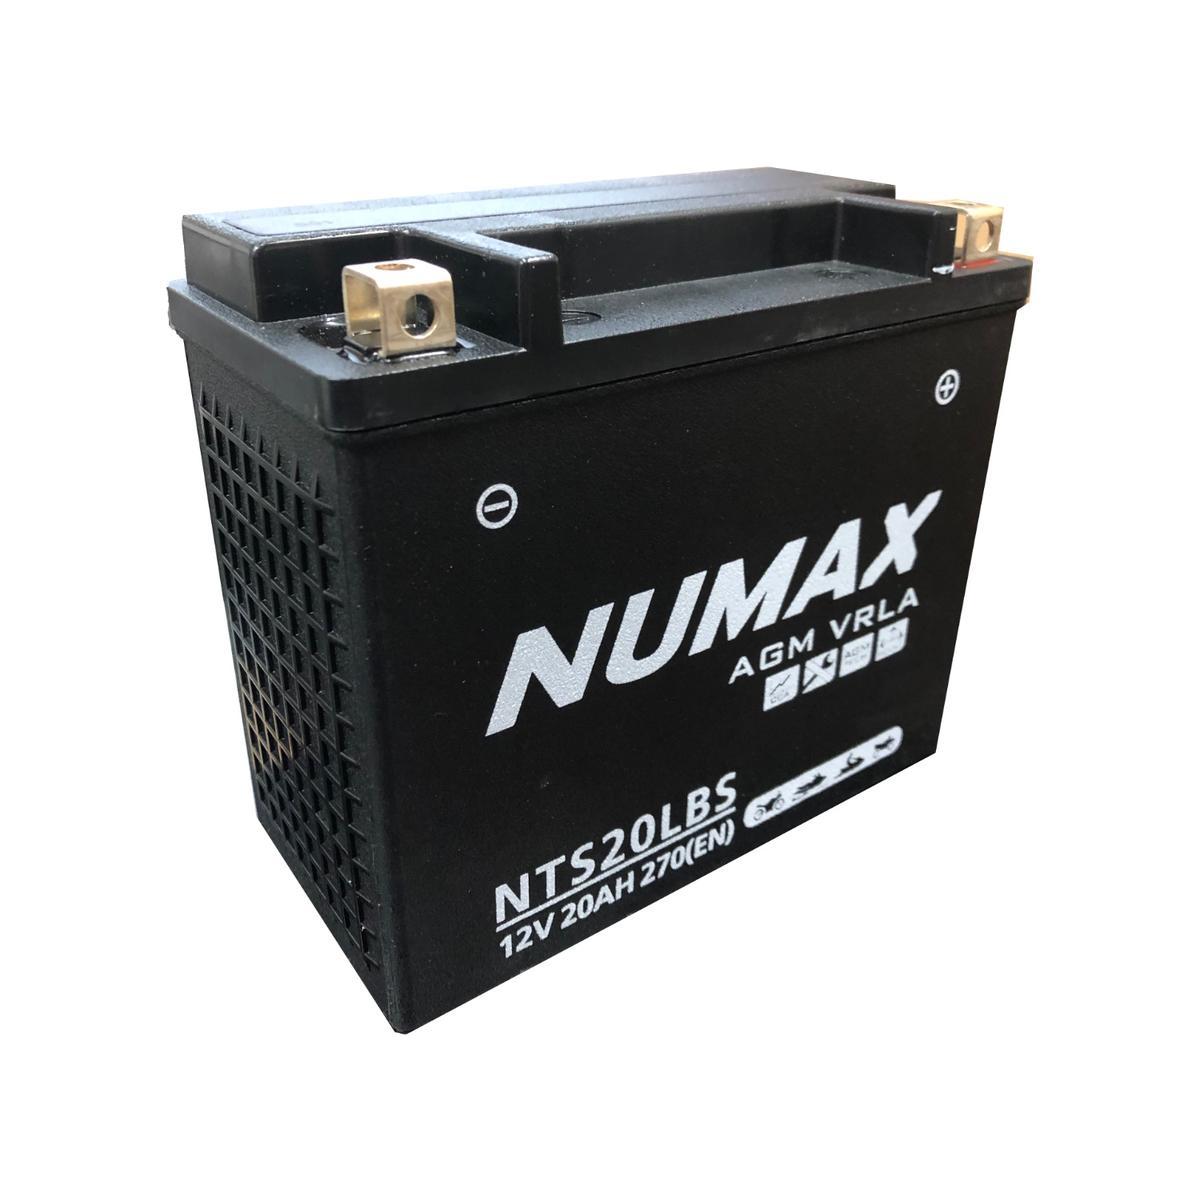 Numax NTS20LBS Yamaha XV1600 A Wild & Road Star Battery